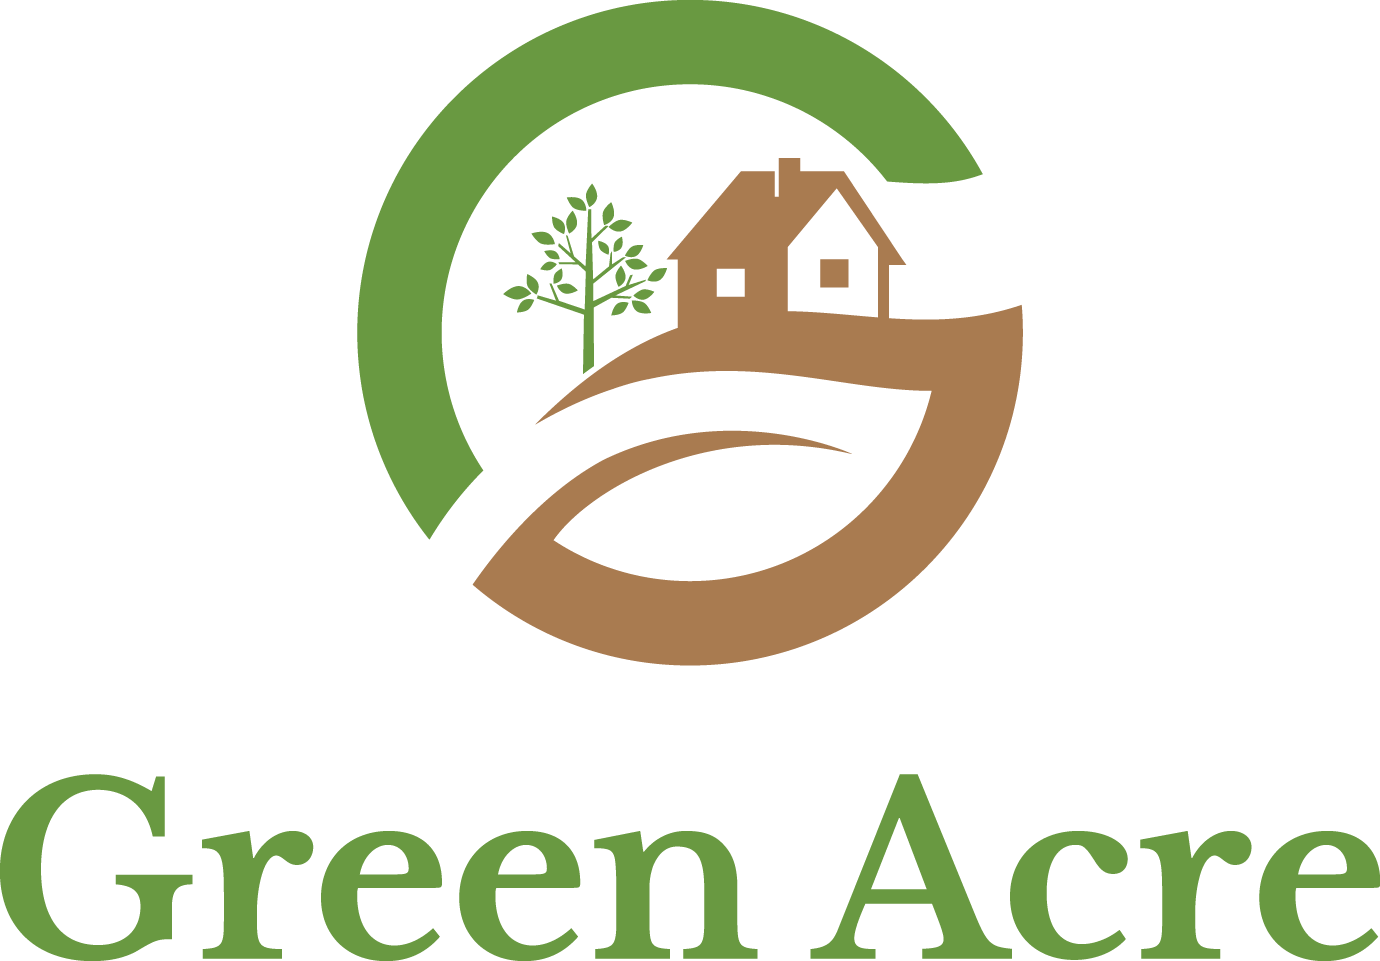 Greenacre.be logo